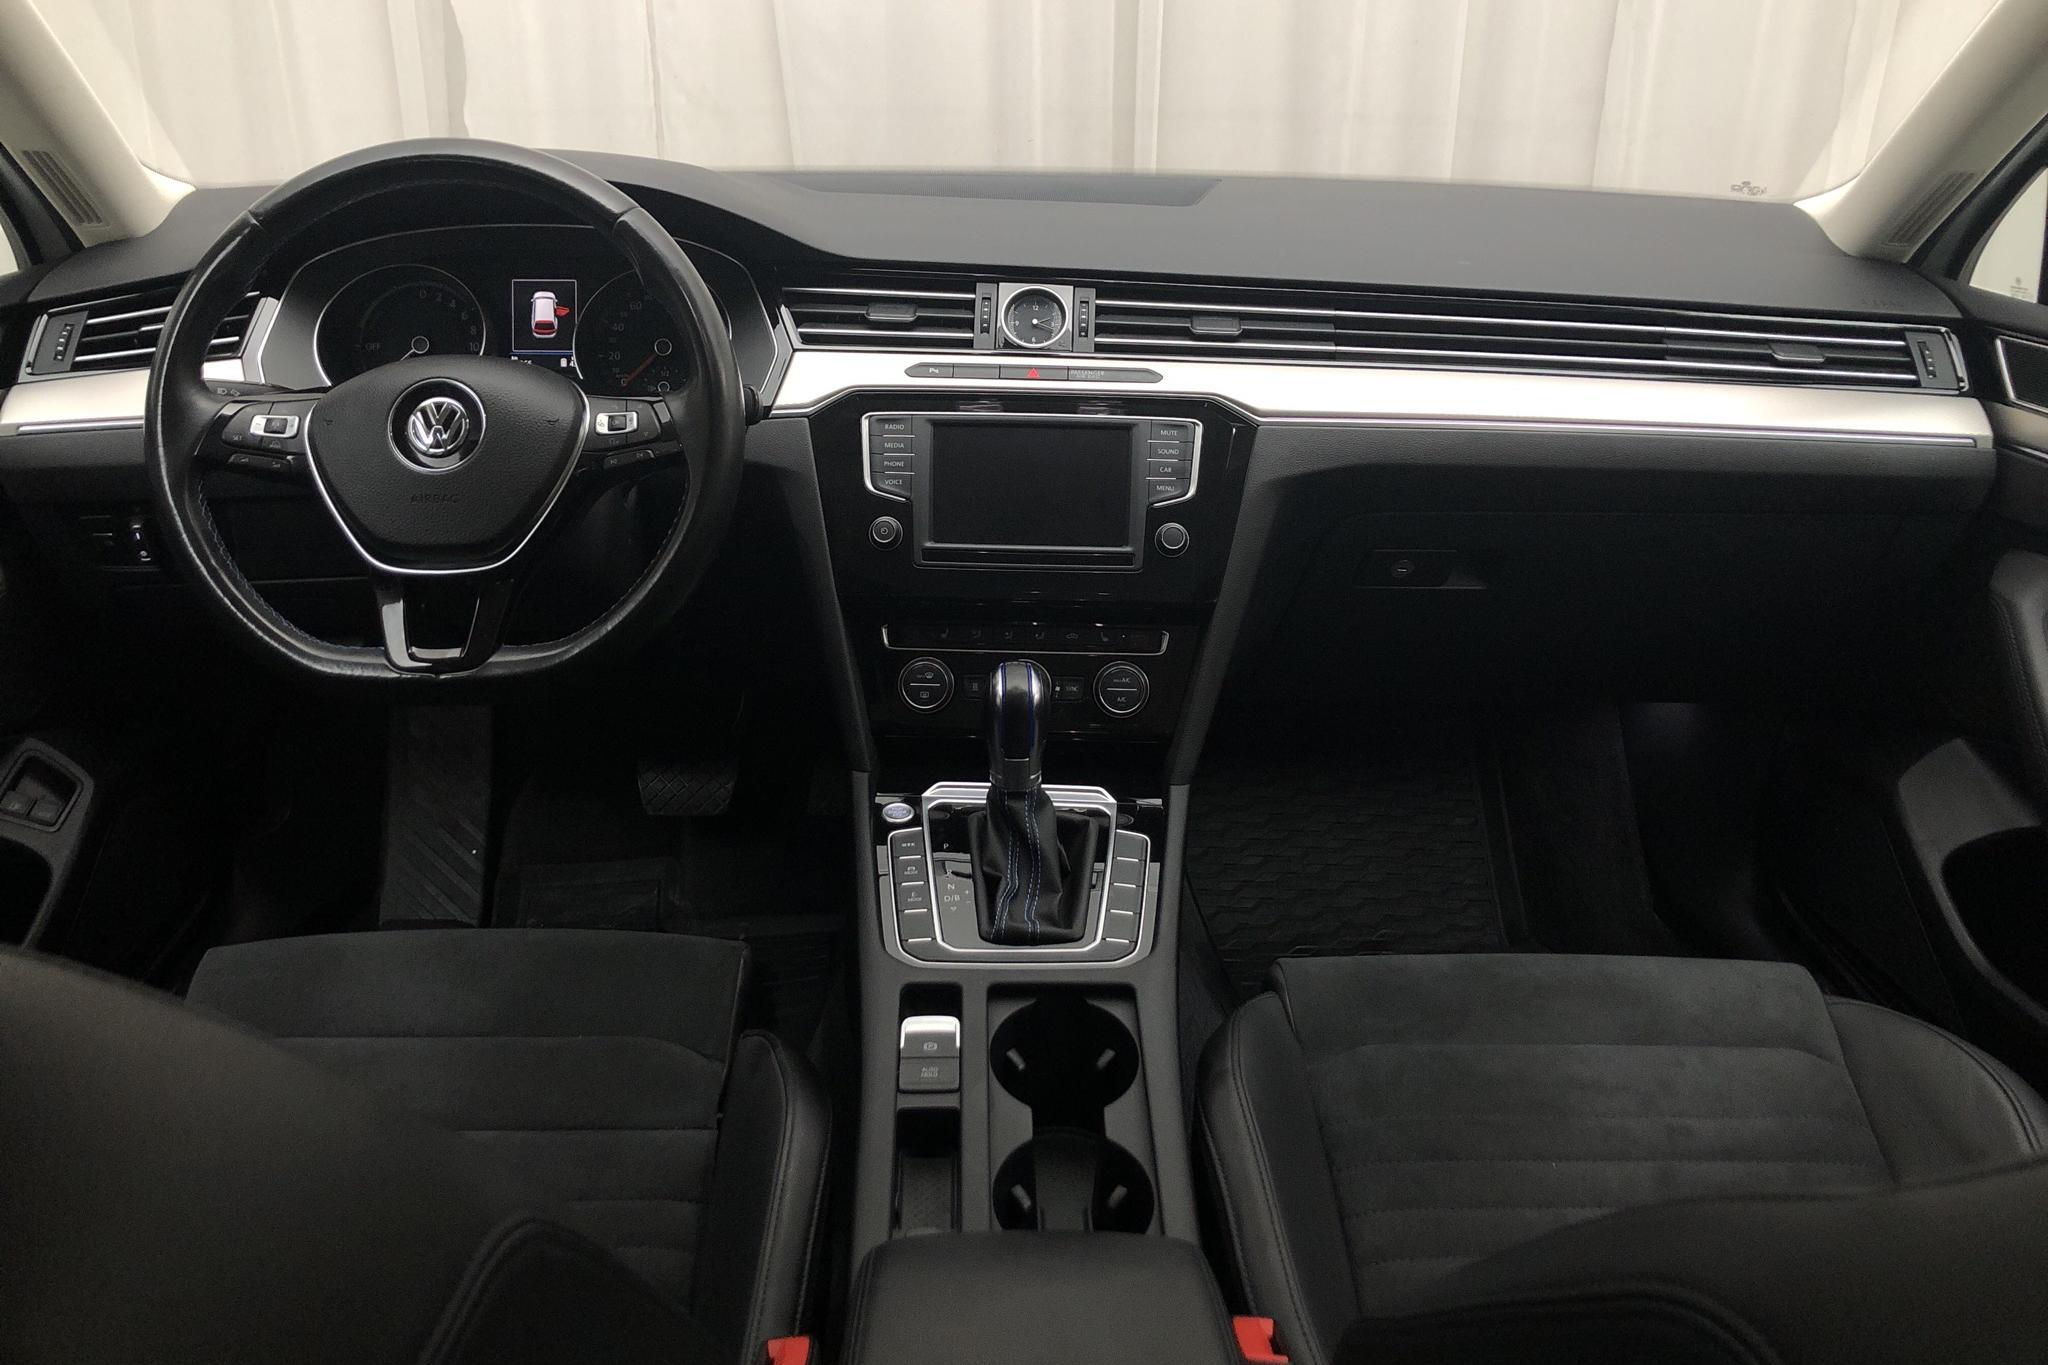 VW Passat 1.4 Plug-in-Hybrid Sportscombi (218hk) - 9 736 mil - Automat - vit - 2017